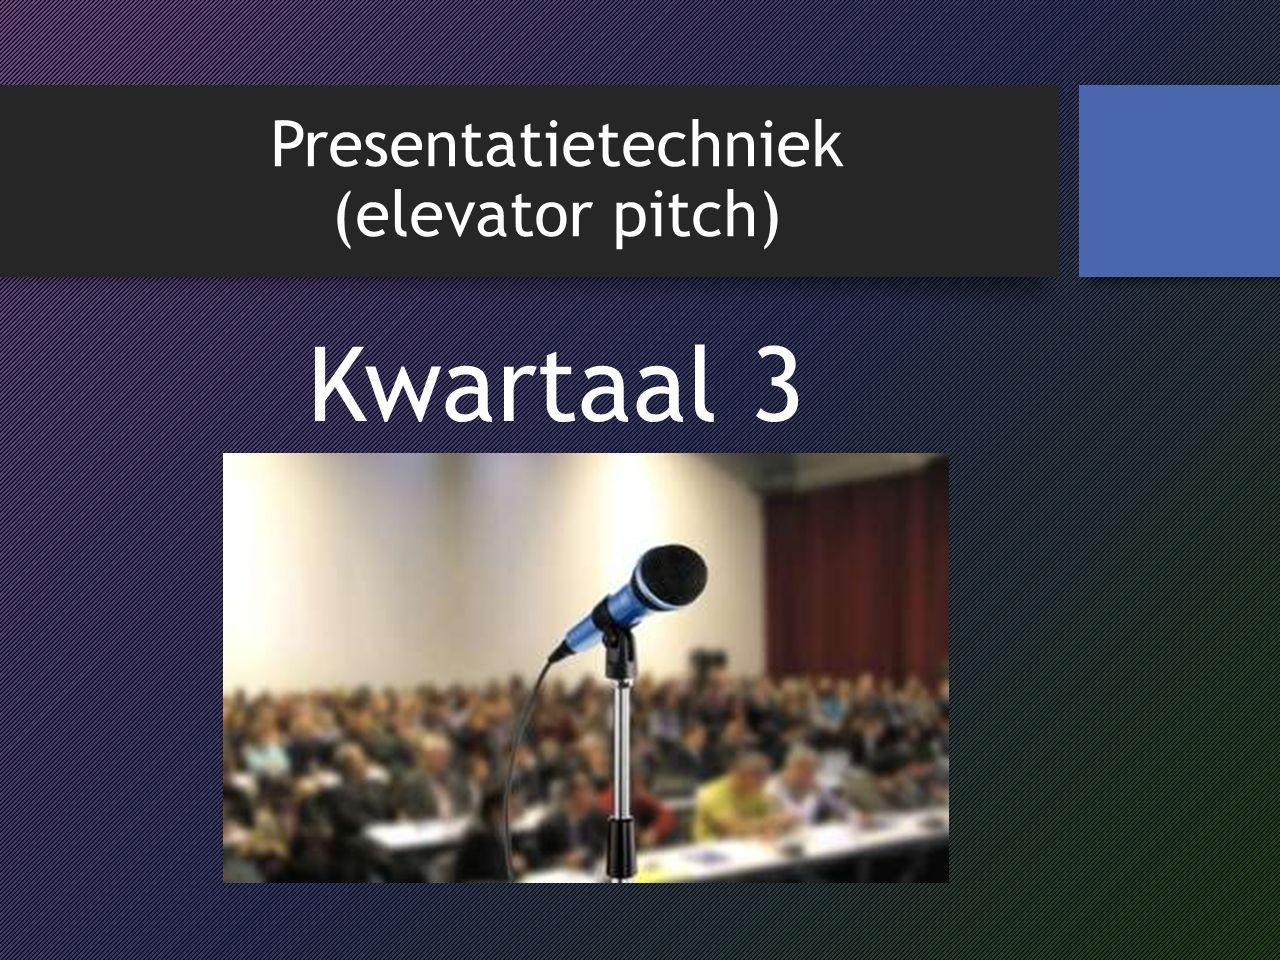 Presentatietechniek (elevator pitch)